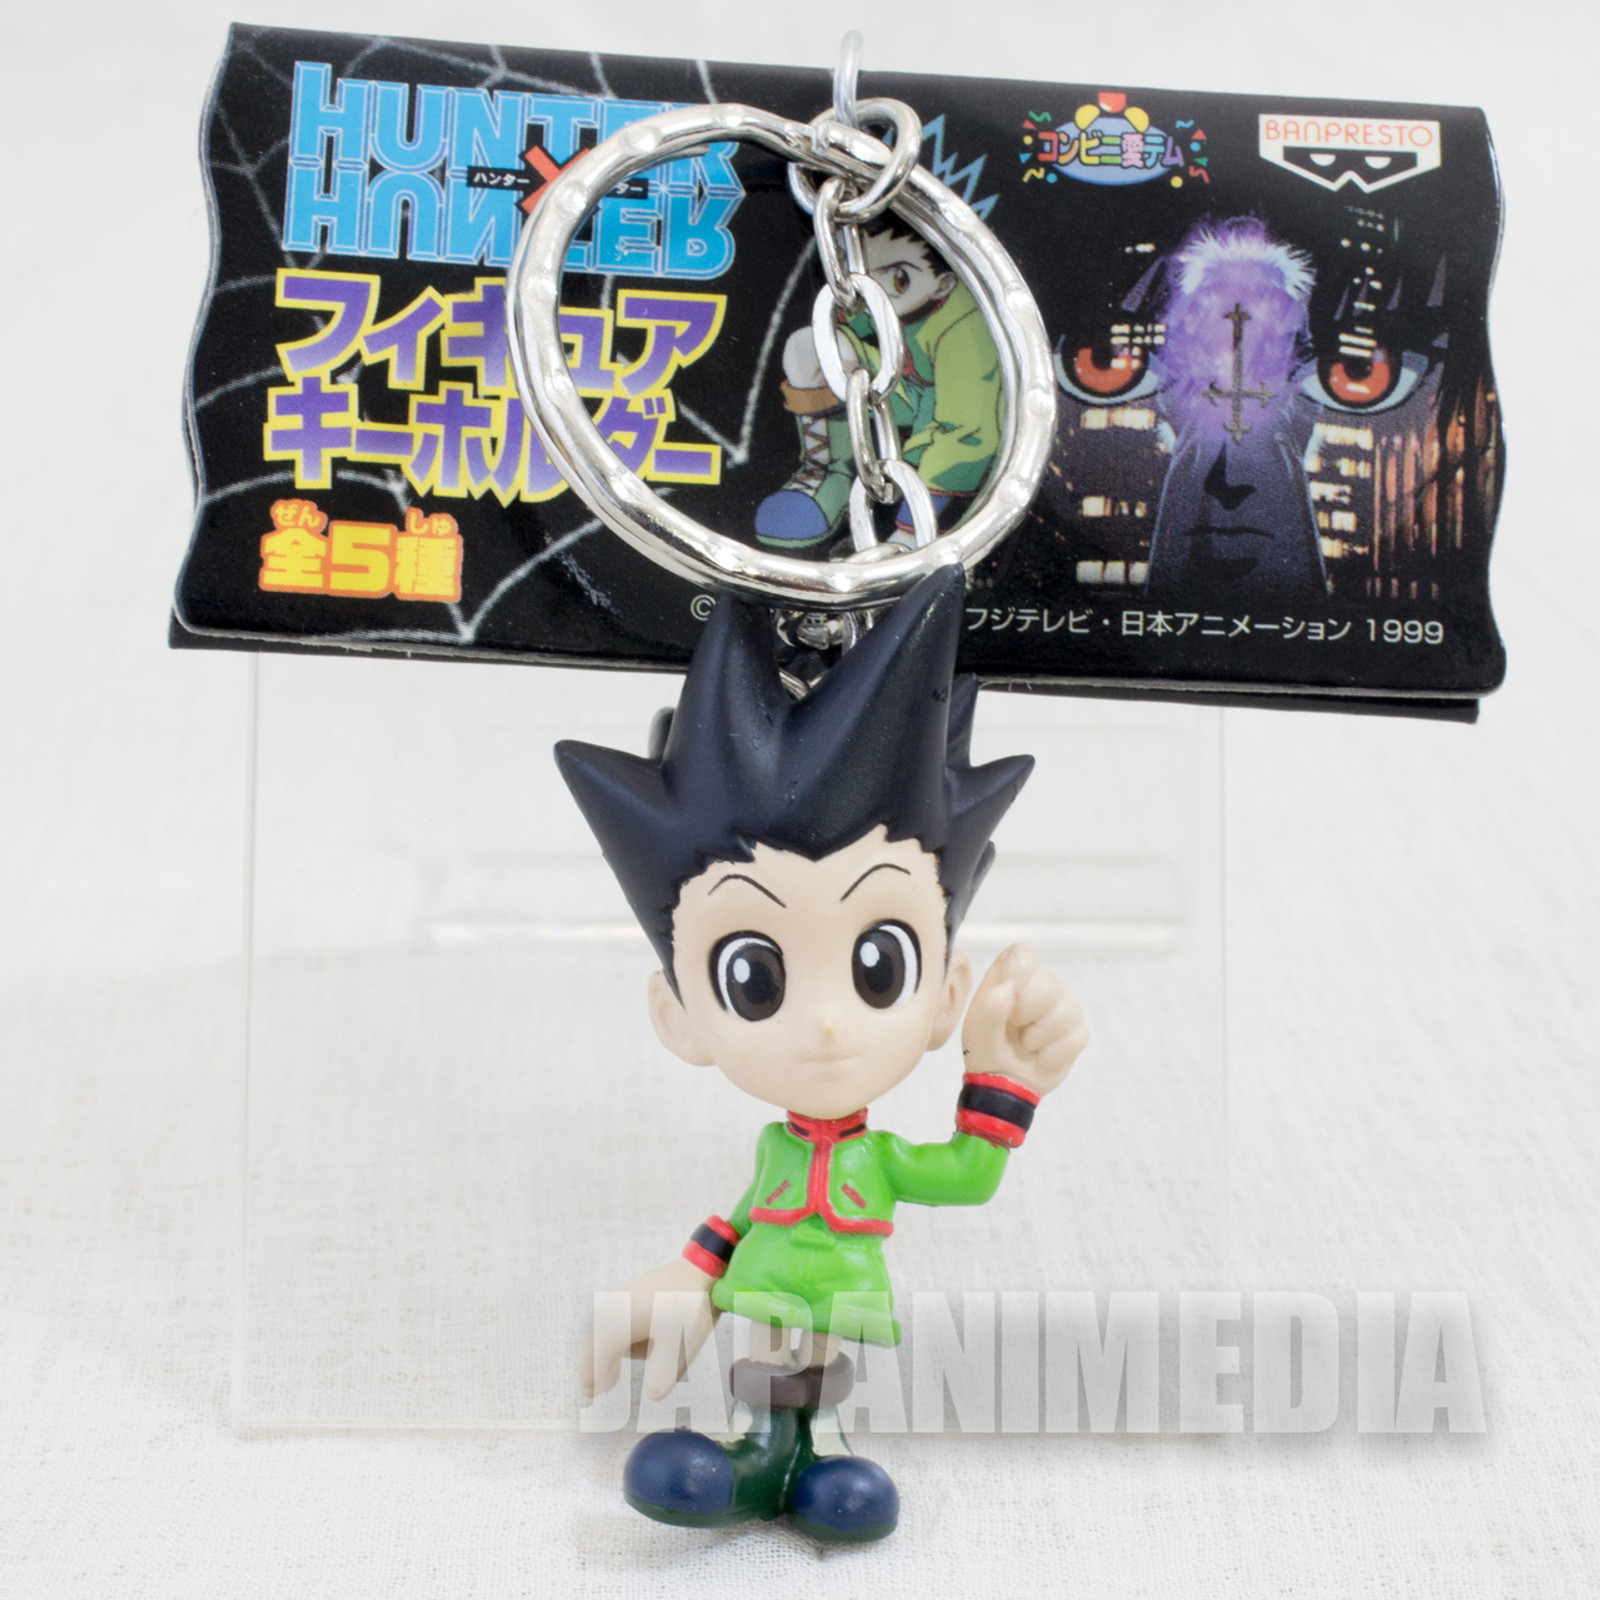 HUNTER x HUNTER Gon Freecss Mini Figure Key Holder Chain Banpresto JAPAN ANIME 3